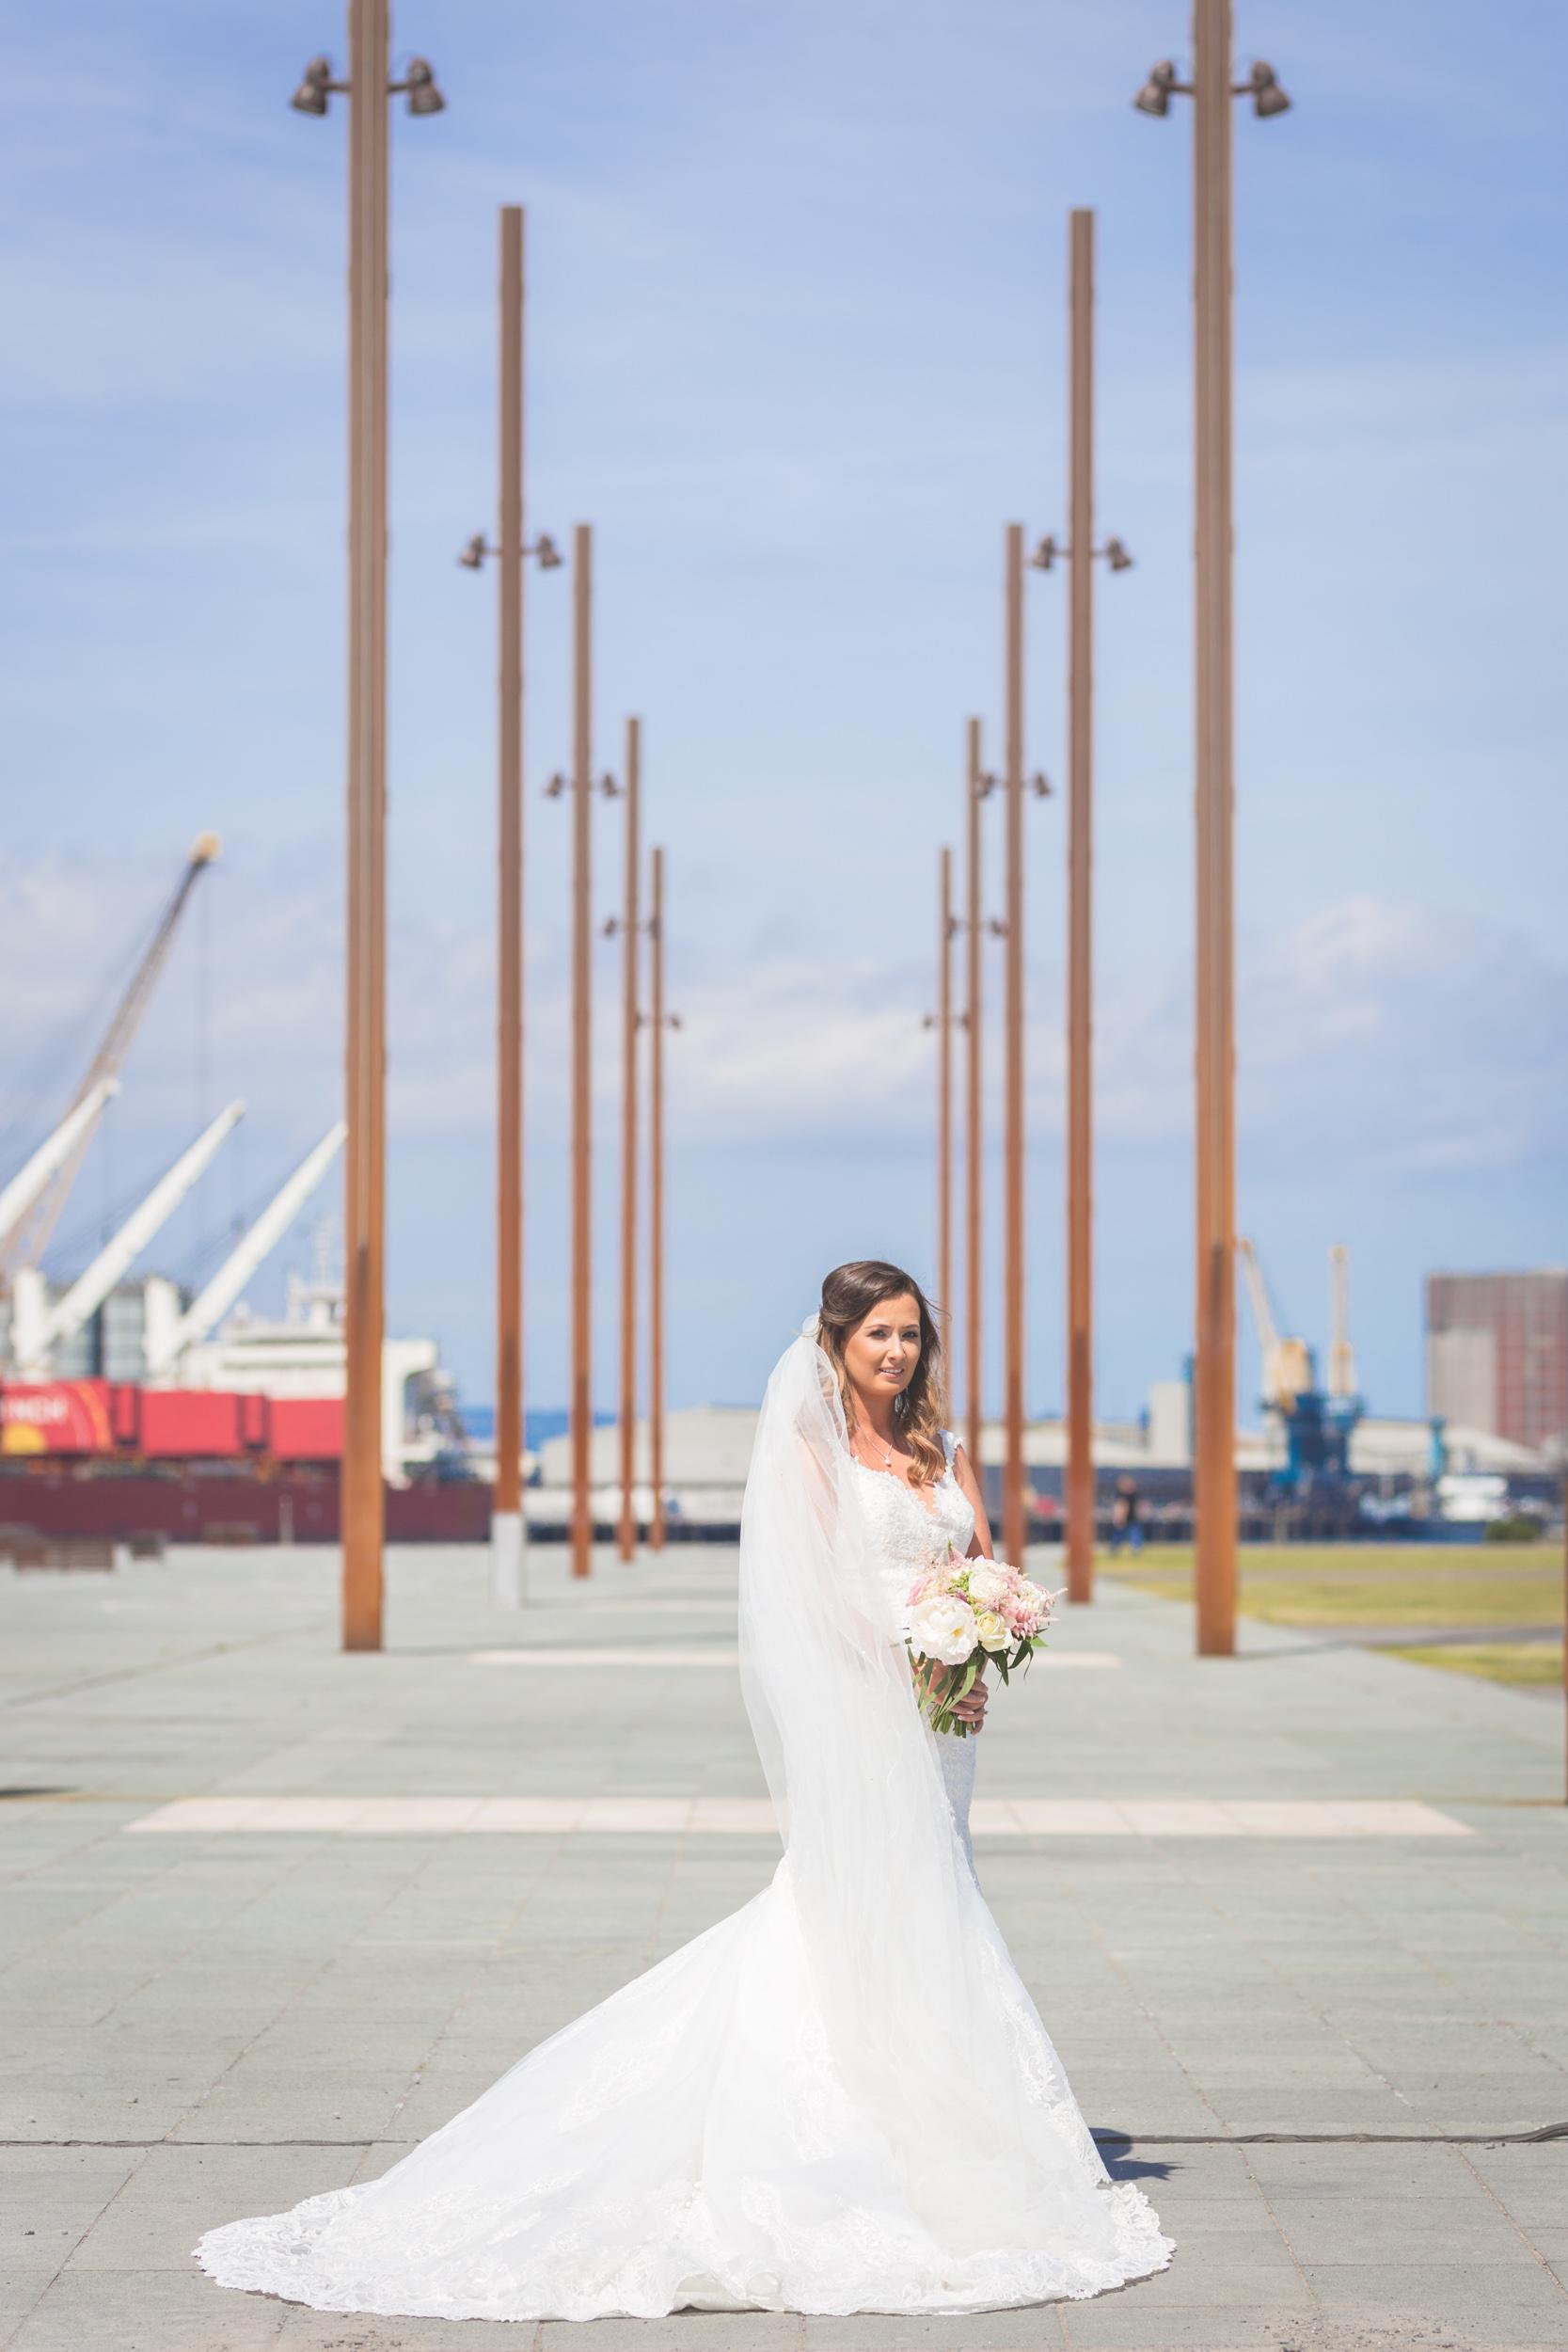 Brian McEwan   Northern Ireland Wedding Photographer   Rebecca & Michael   Portraits-42.jpg